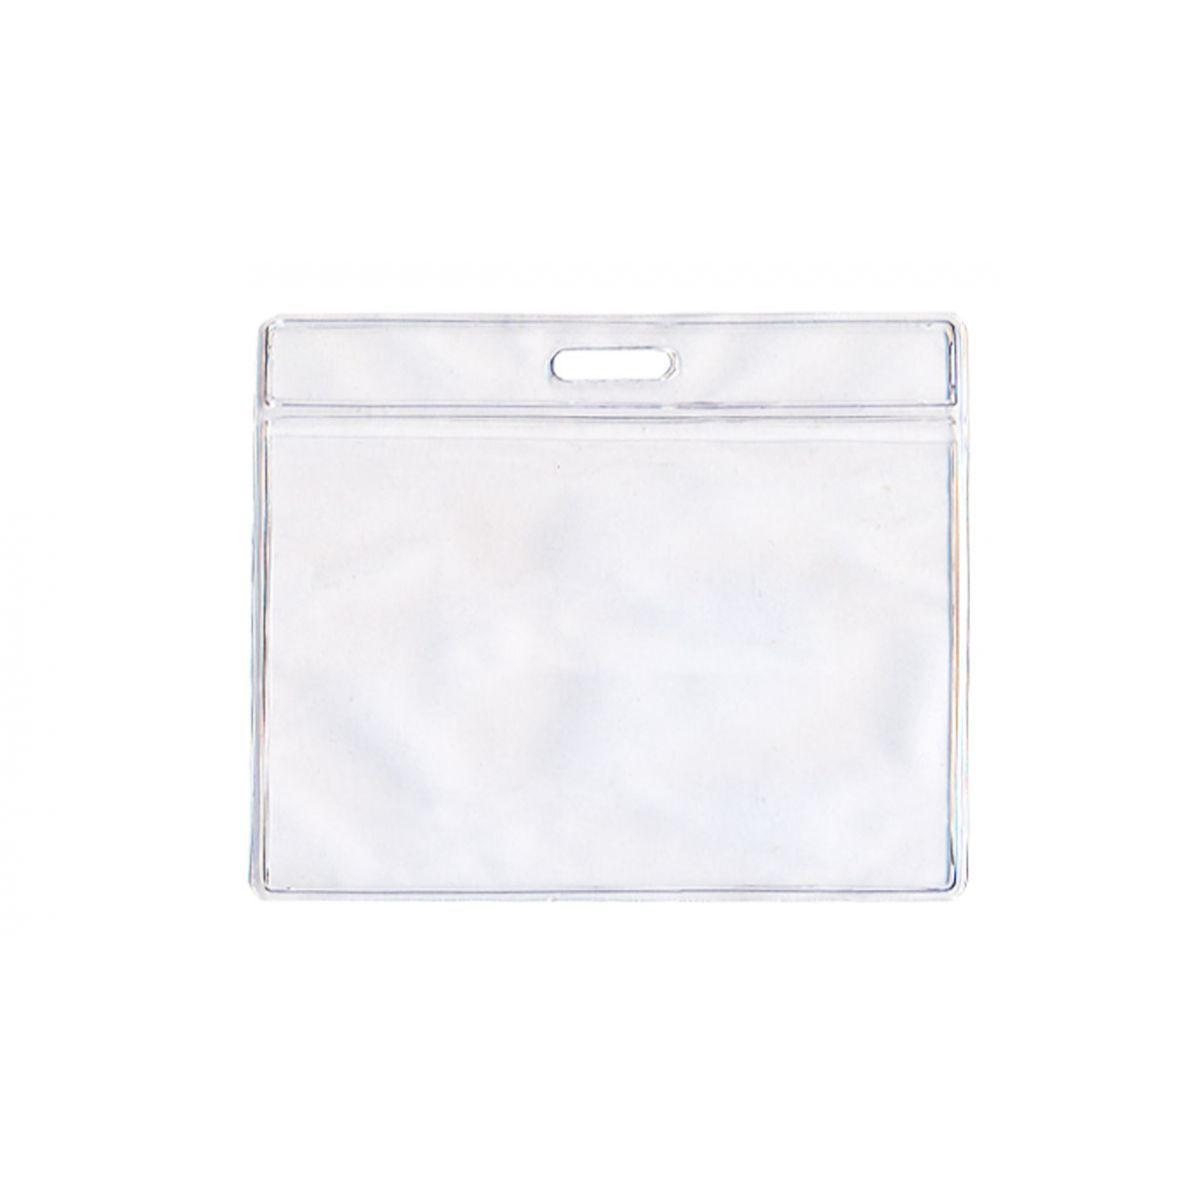 Kit 1000 Protetores Porta Crachá em Bolsa PVC Cristal Horizontal 58x89x0,20mm  - Click Suprimentos